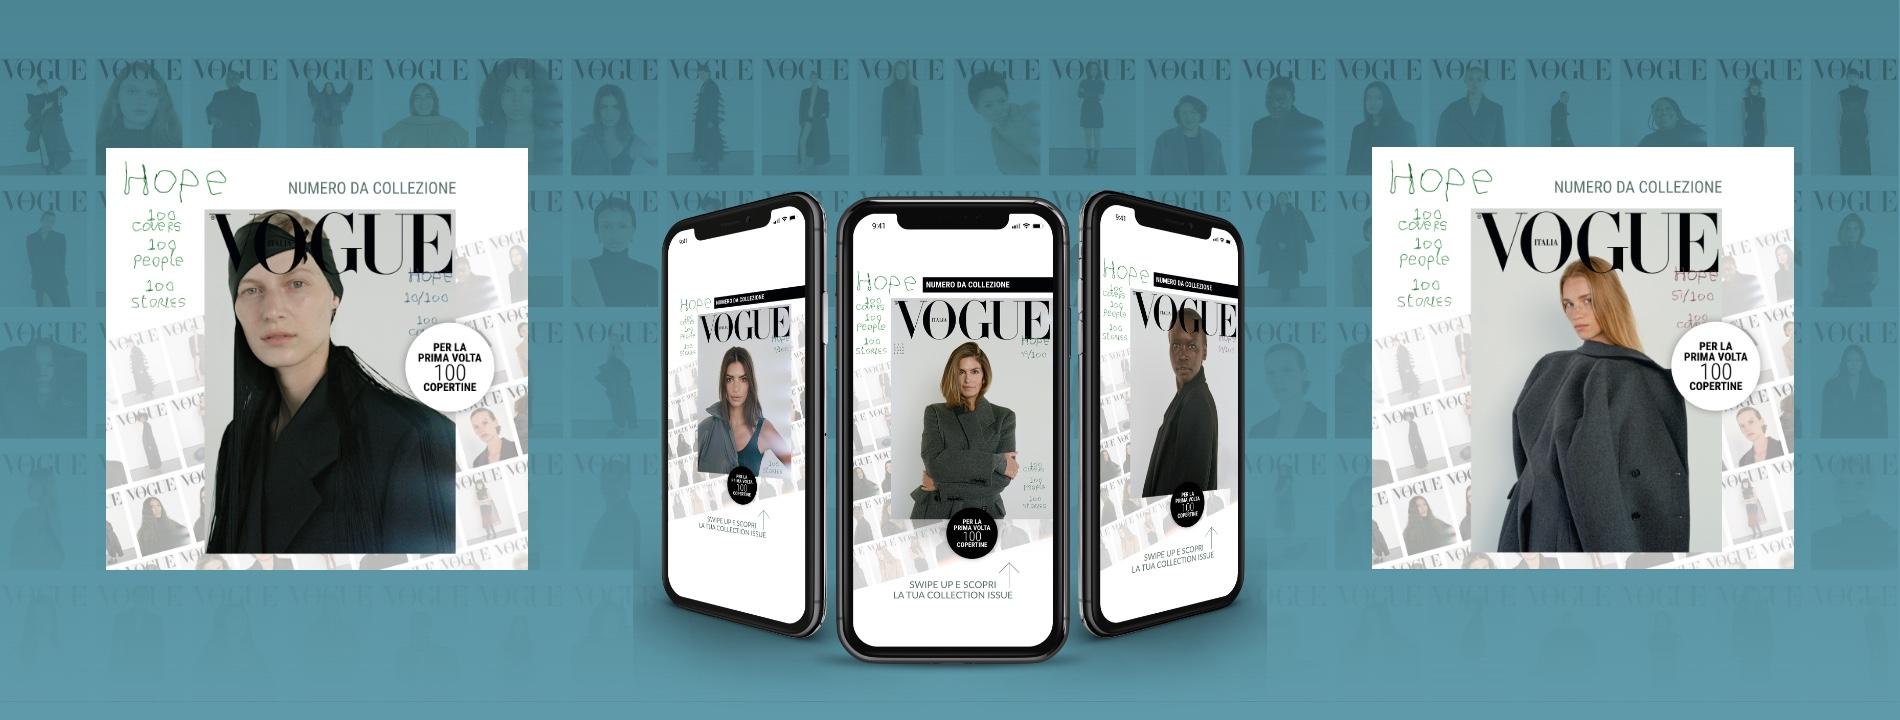 Vogue Italia sceglie Arachno per la campagna digital di Vogue Hope